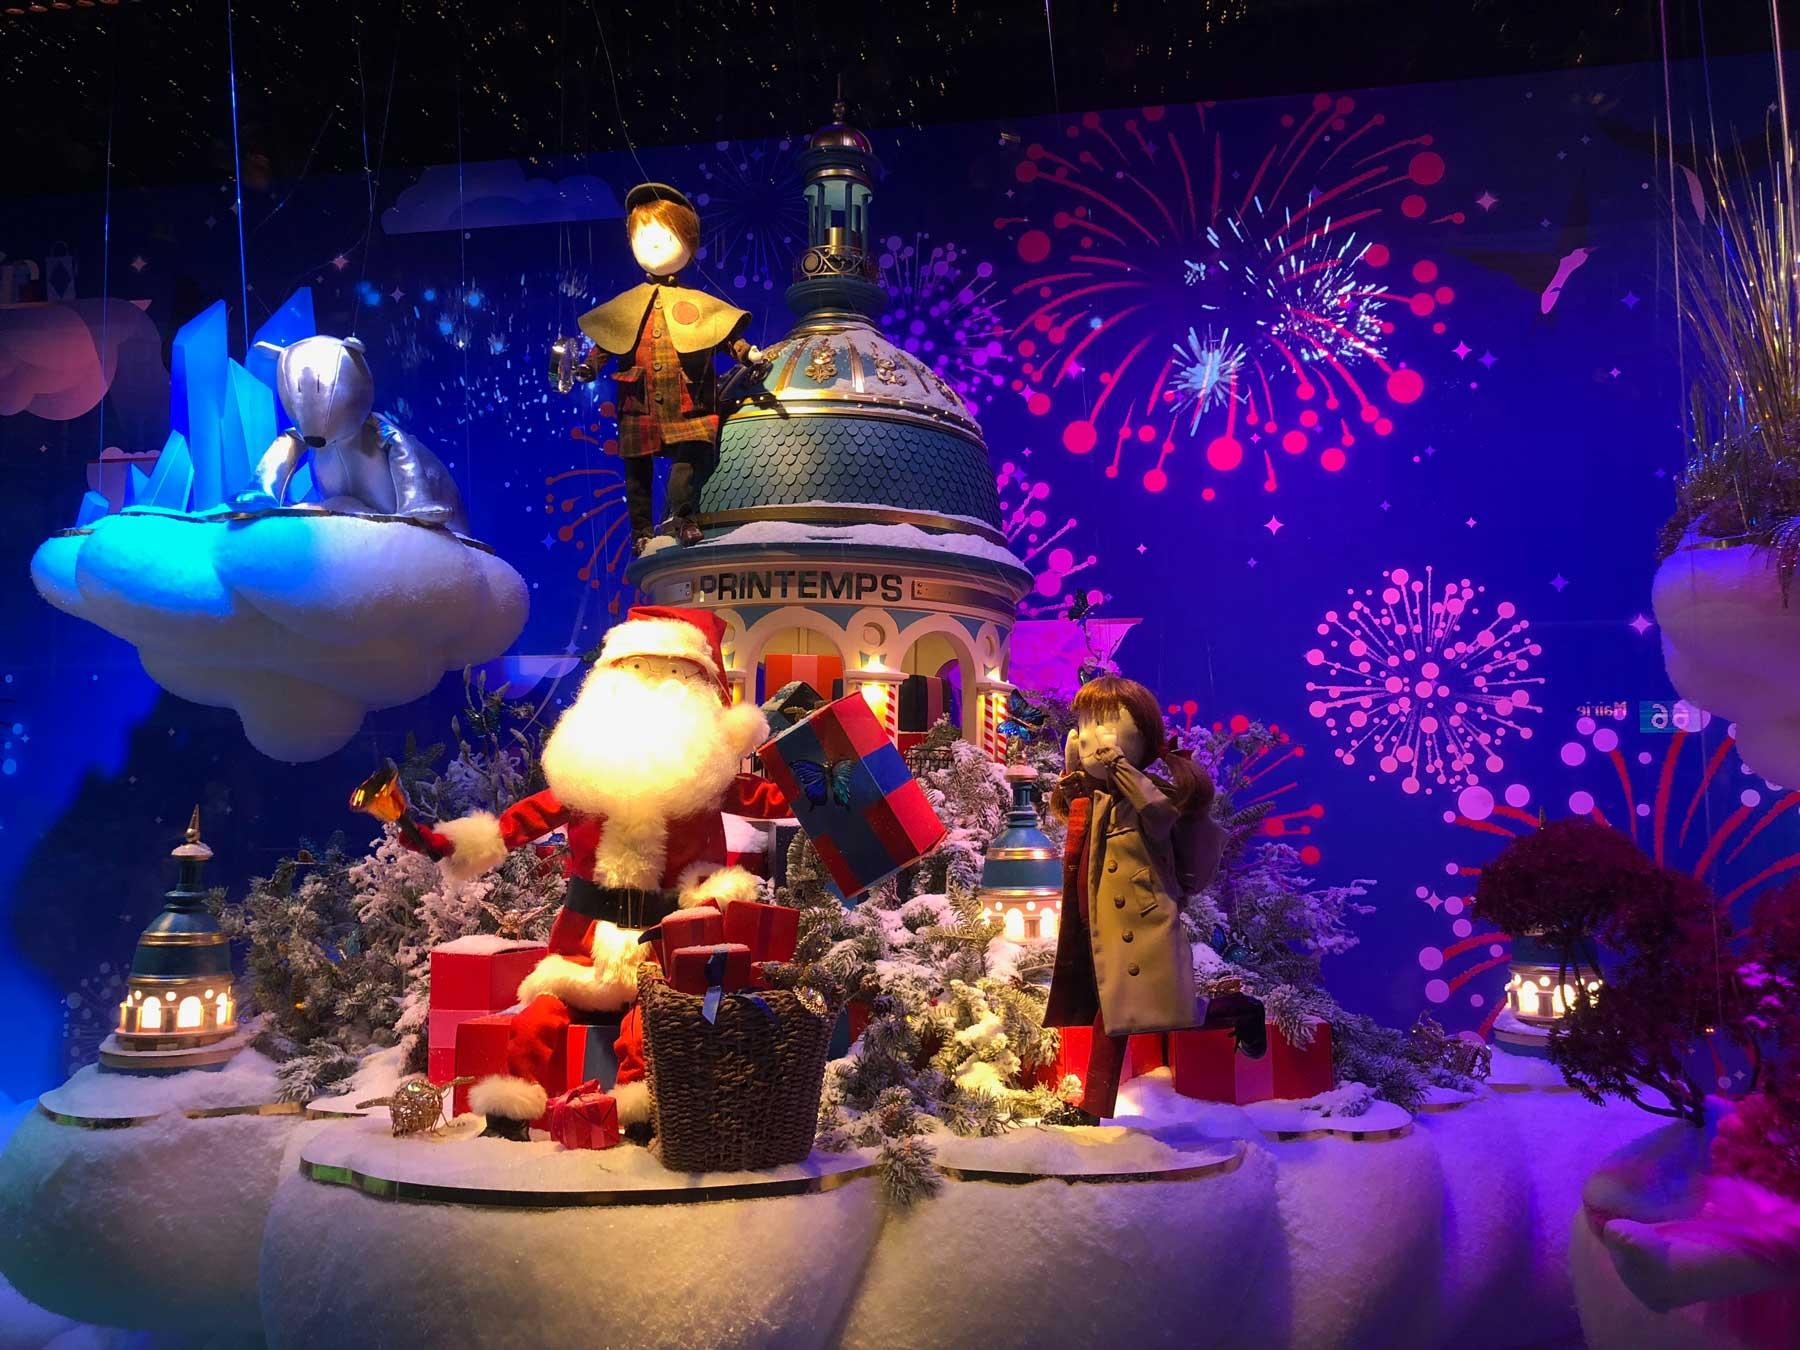 printemps-haussmann-christmas-santa-large